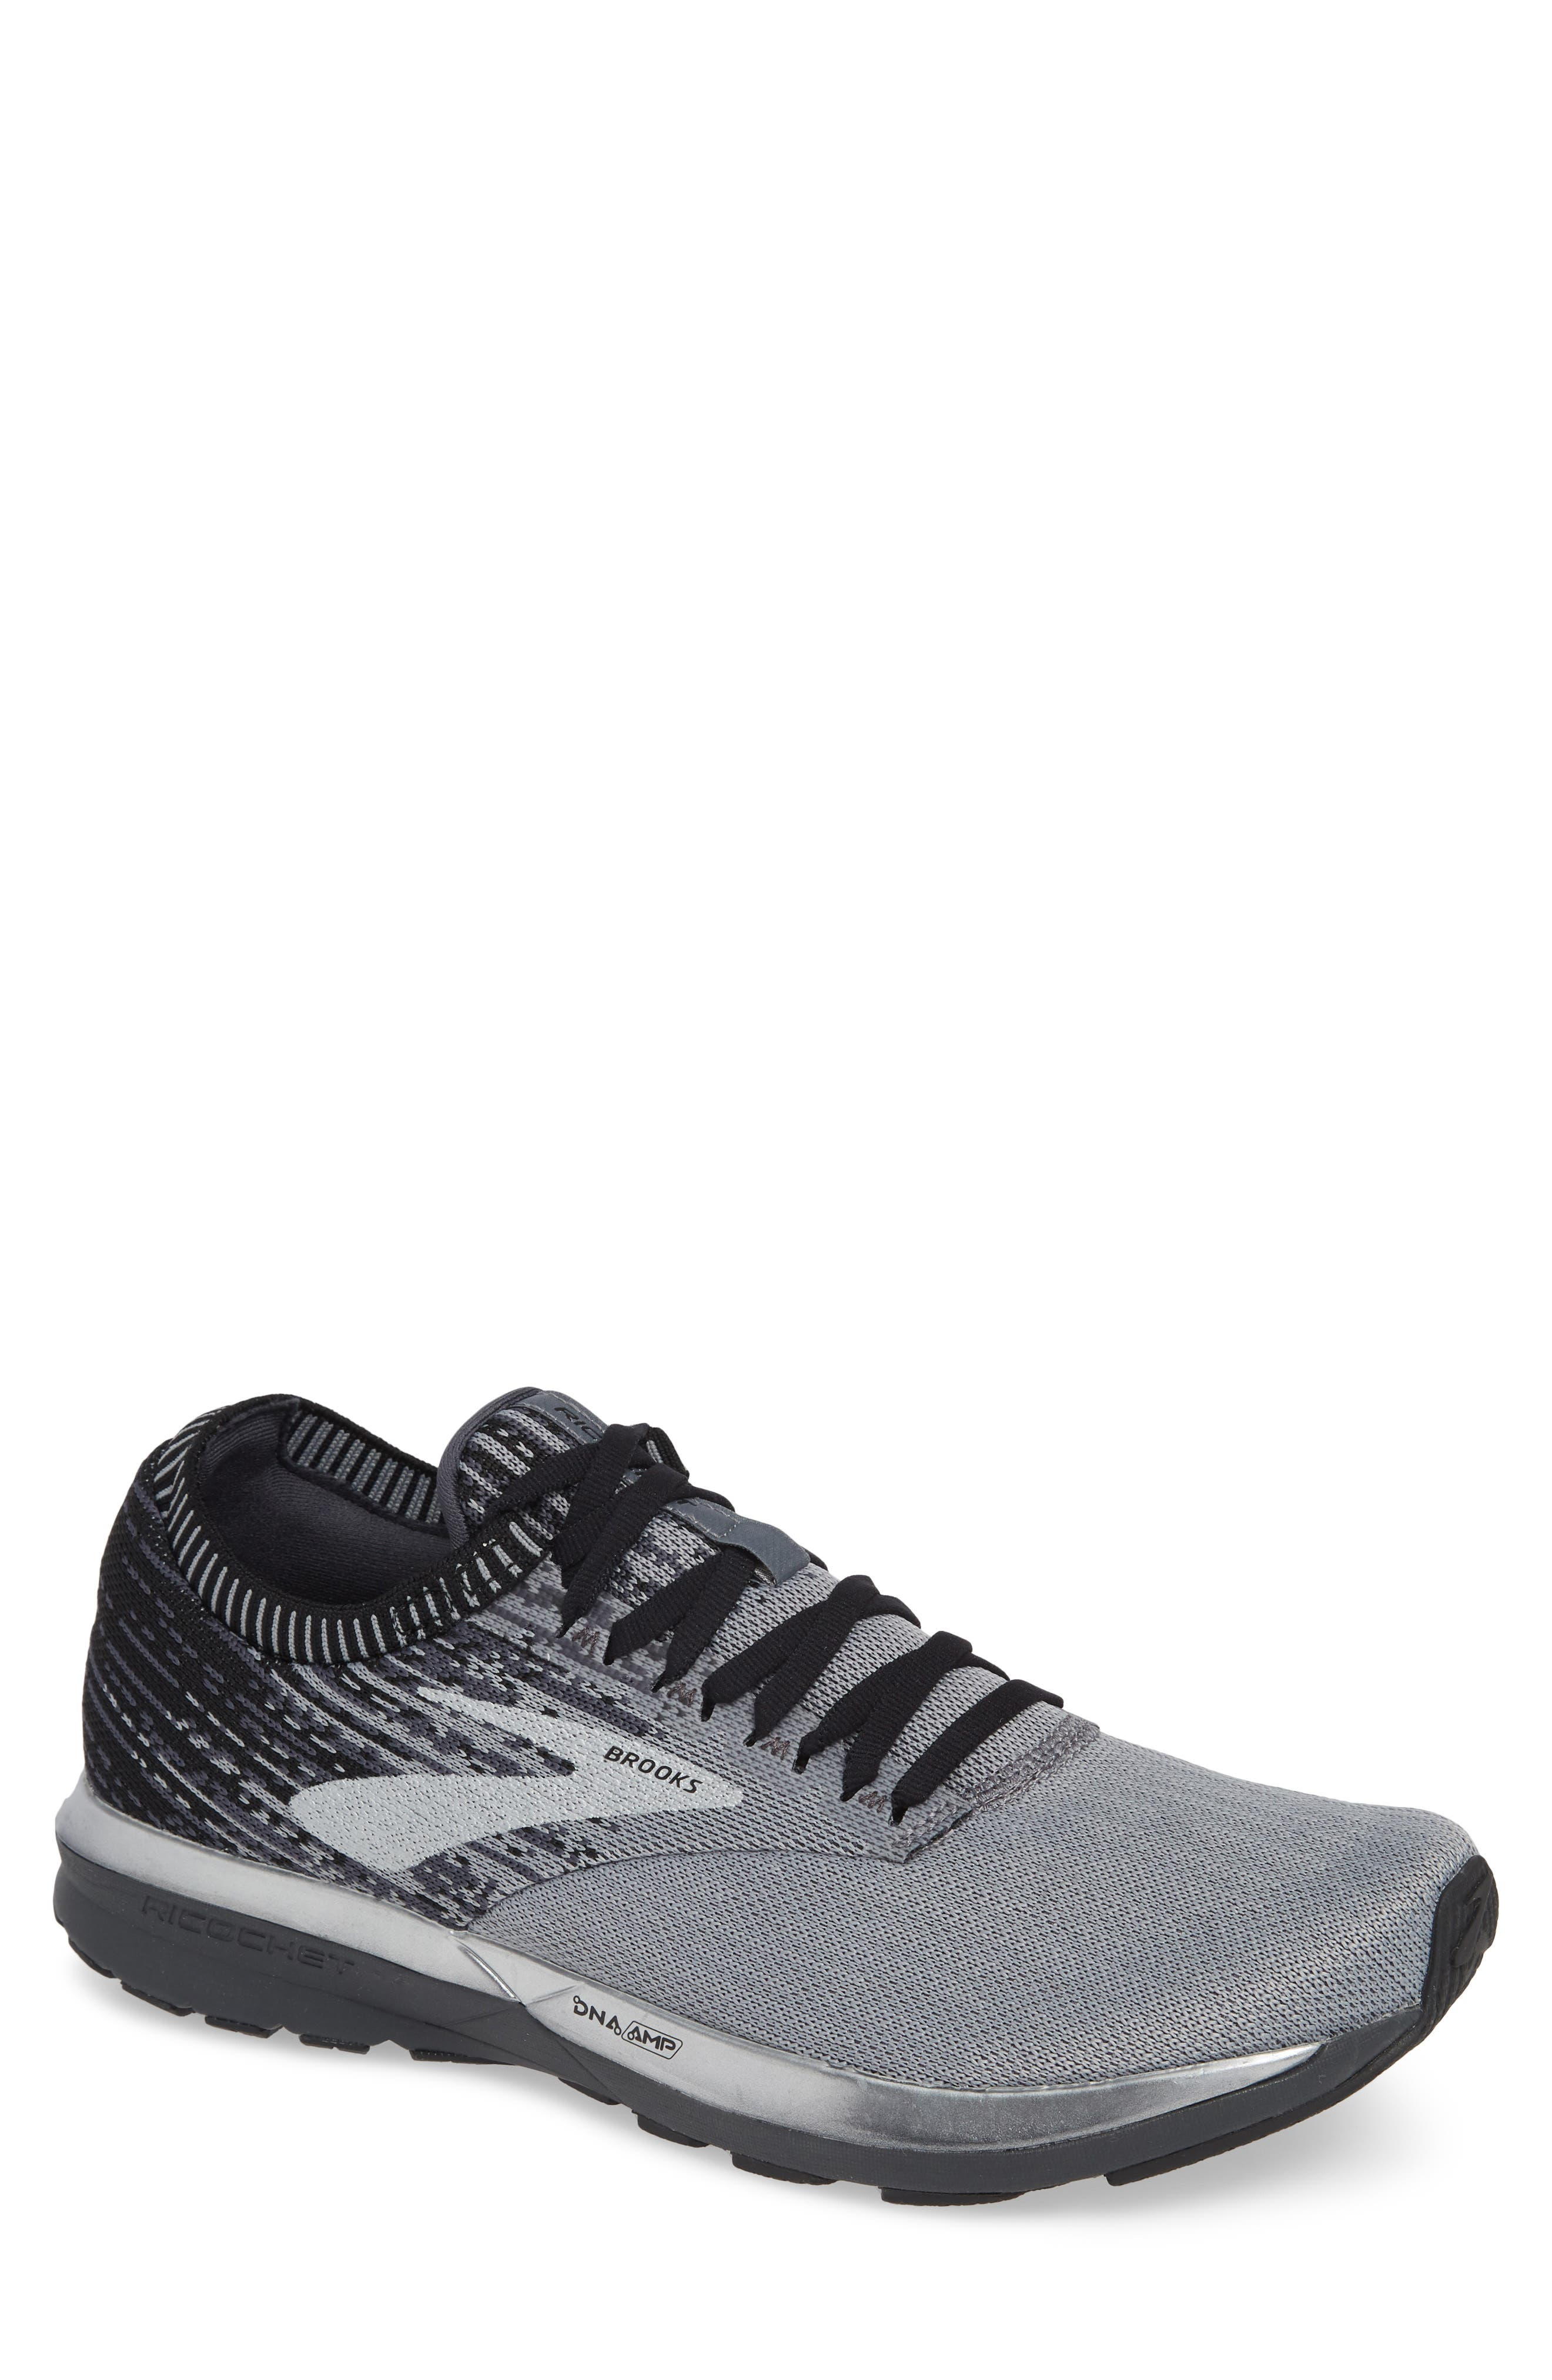 def4e616954 Brooks for Men  Running   Walking Shoes